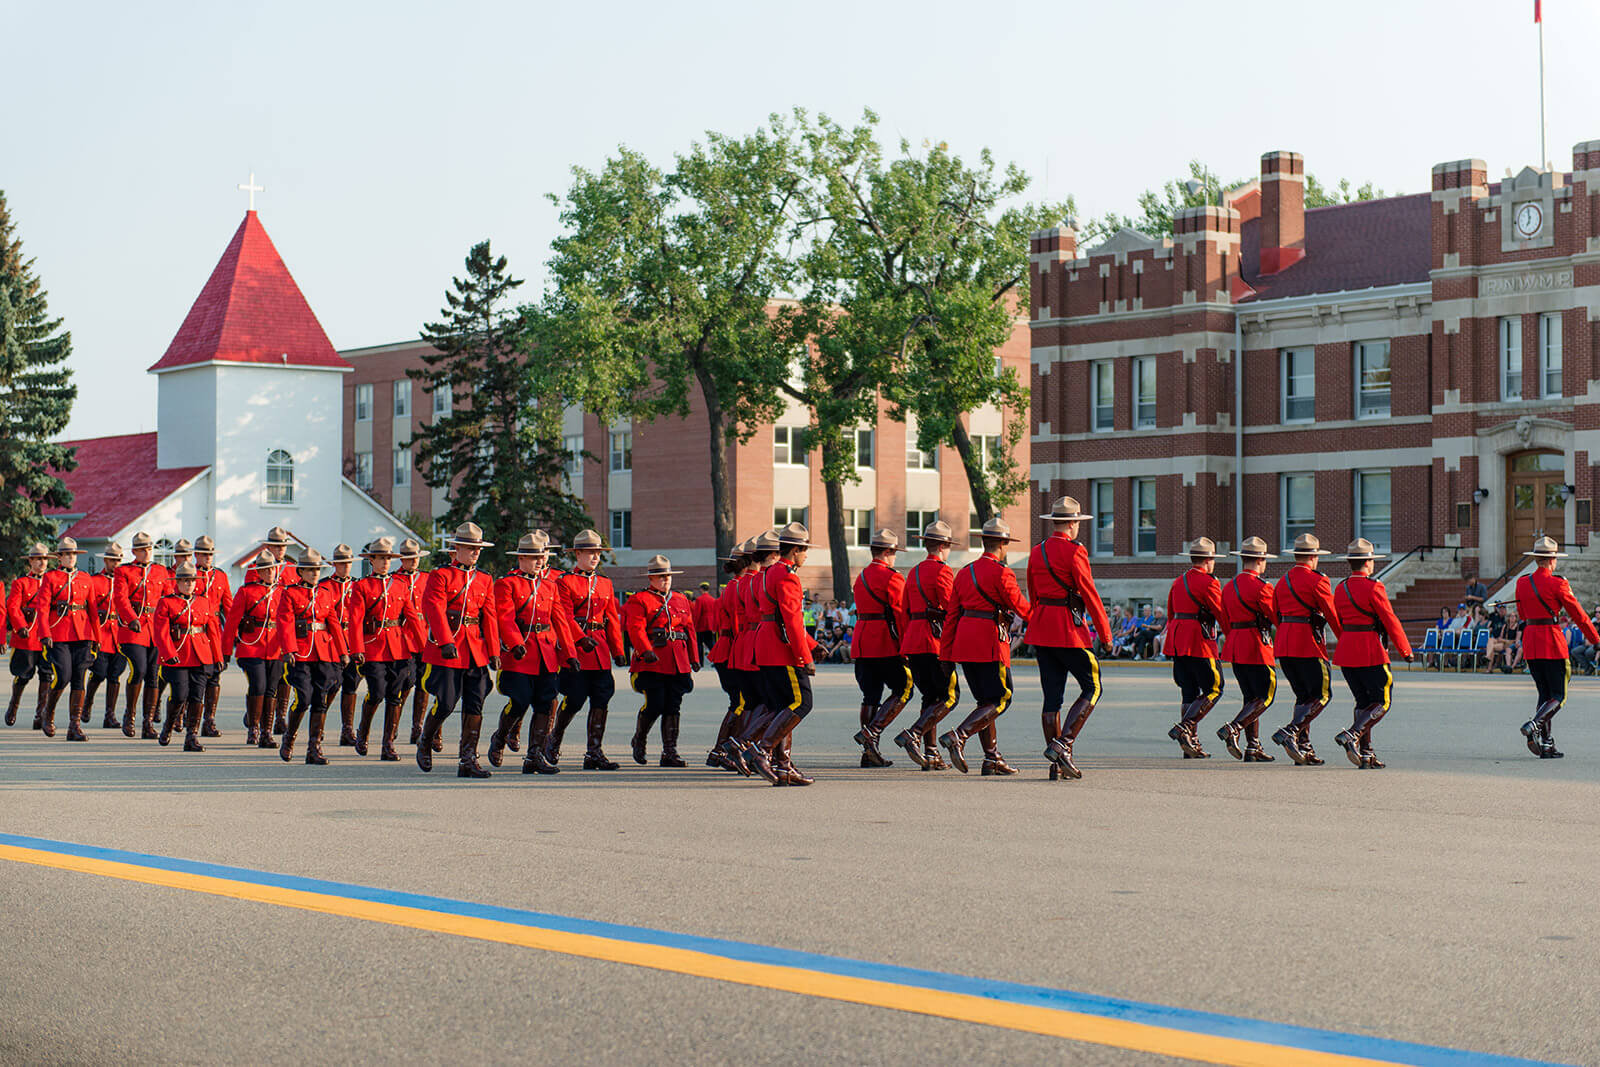 Courtney Liske Photography - Regina Family Photographer - RCMP - Sunset-Retreat Ceremony - Marching